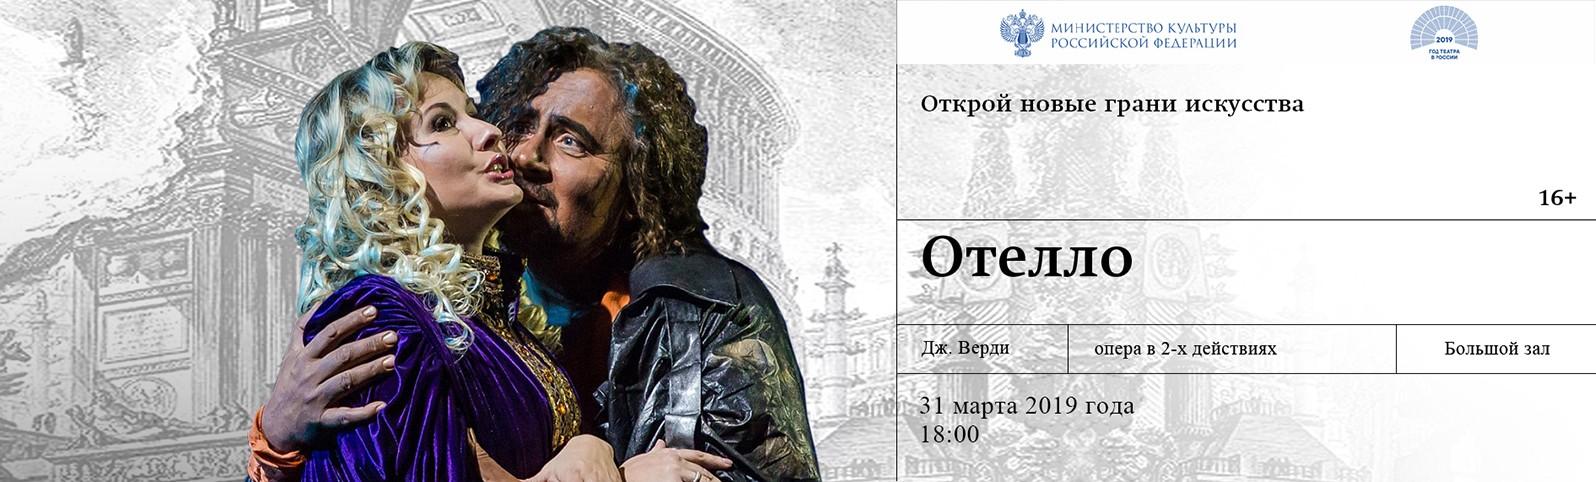 "Опера ""Отелло"""